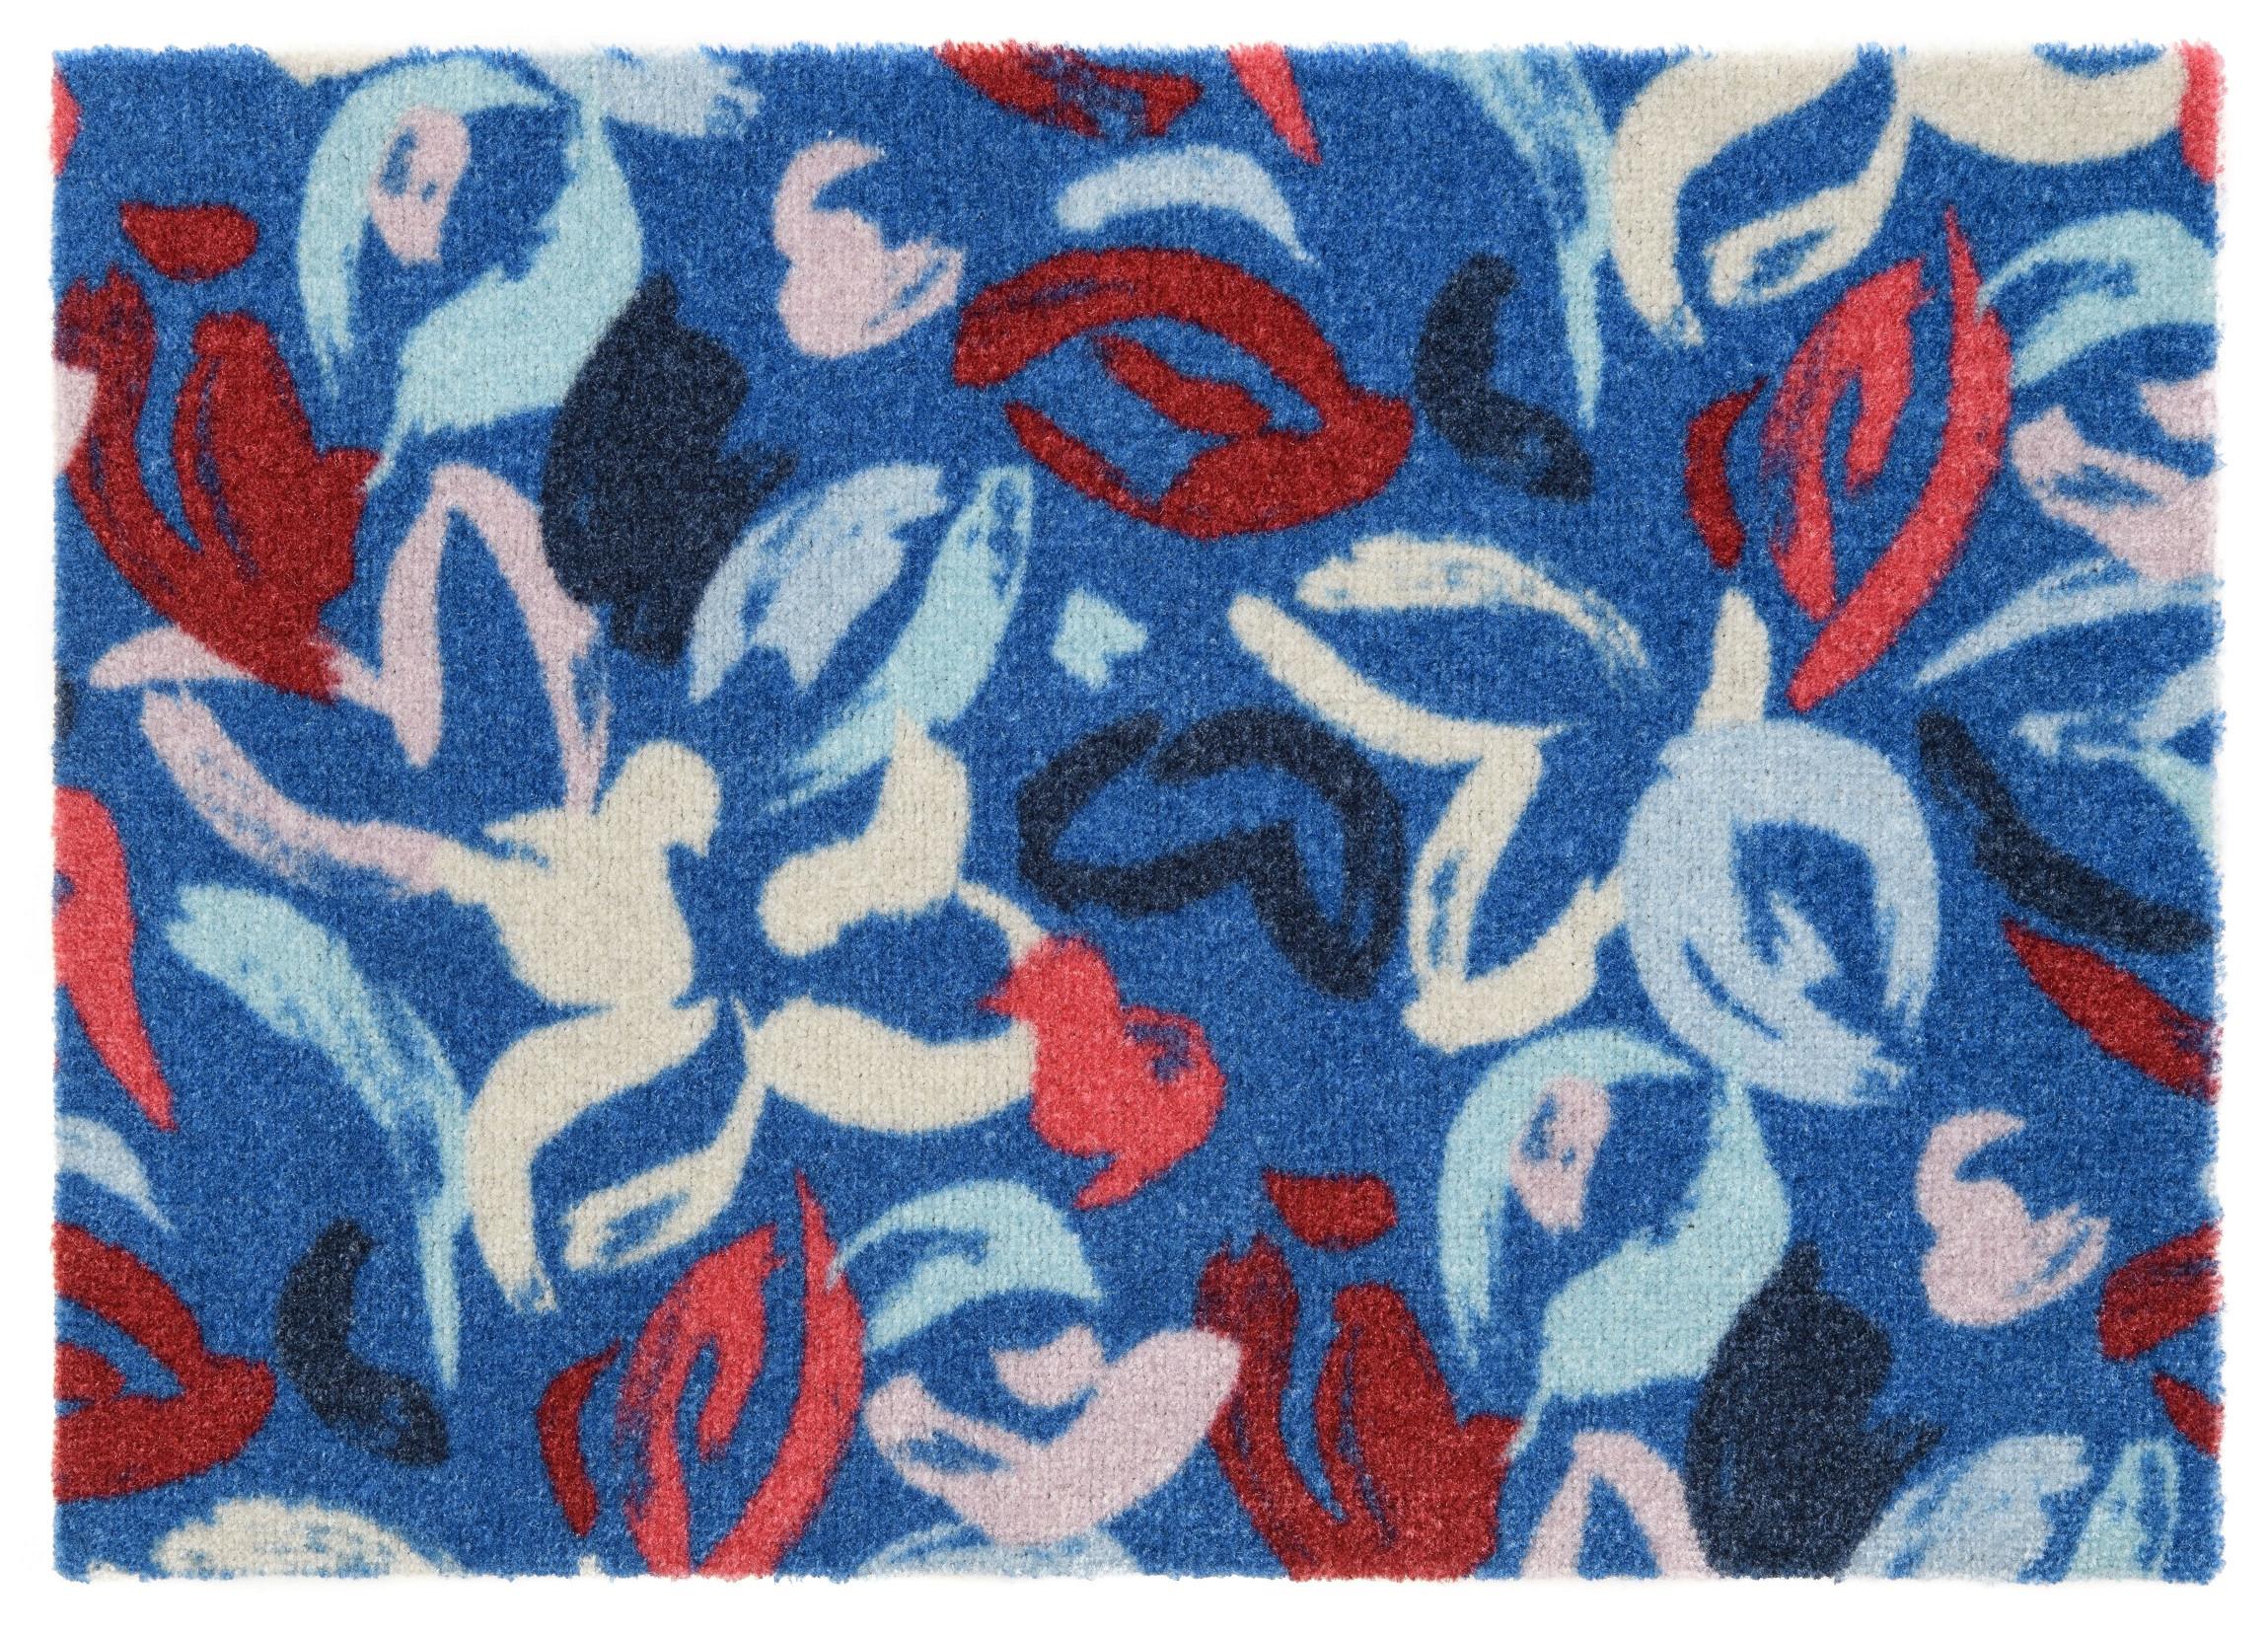 ELLE Decor koberce Protiskluzová rohožka Viva 104032 Blue z kolekce Elle - 50x70 cm